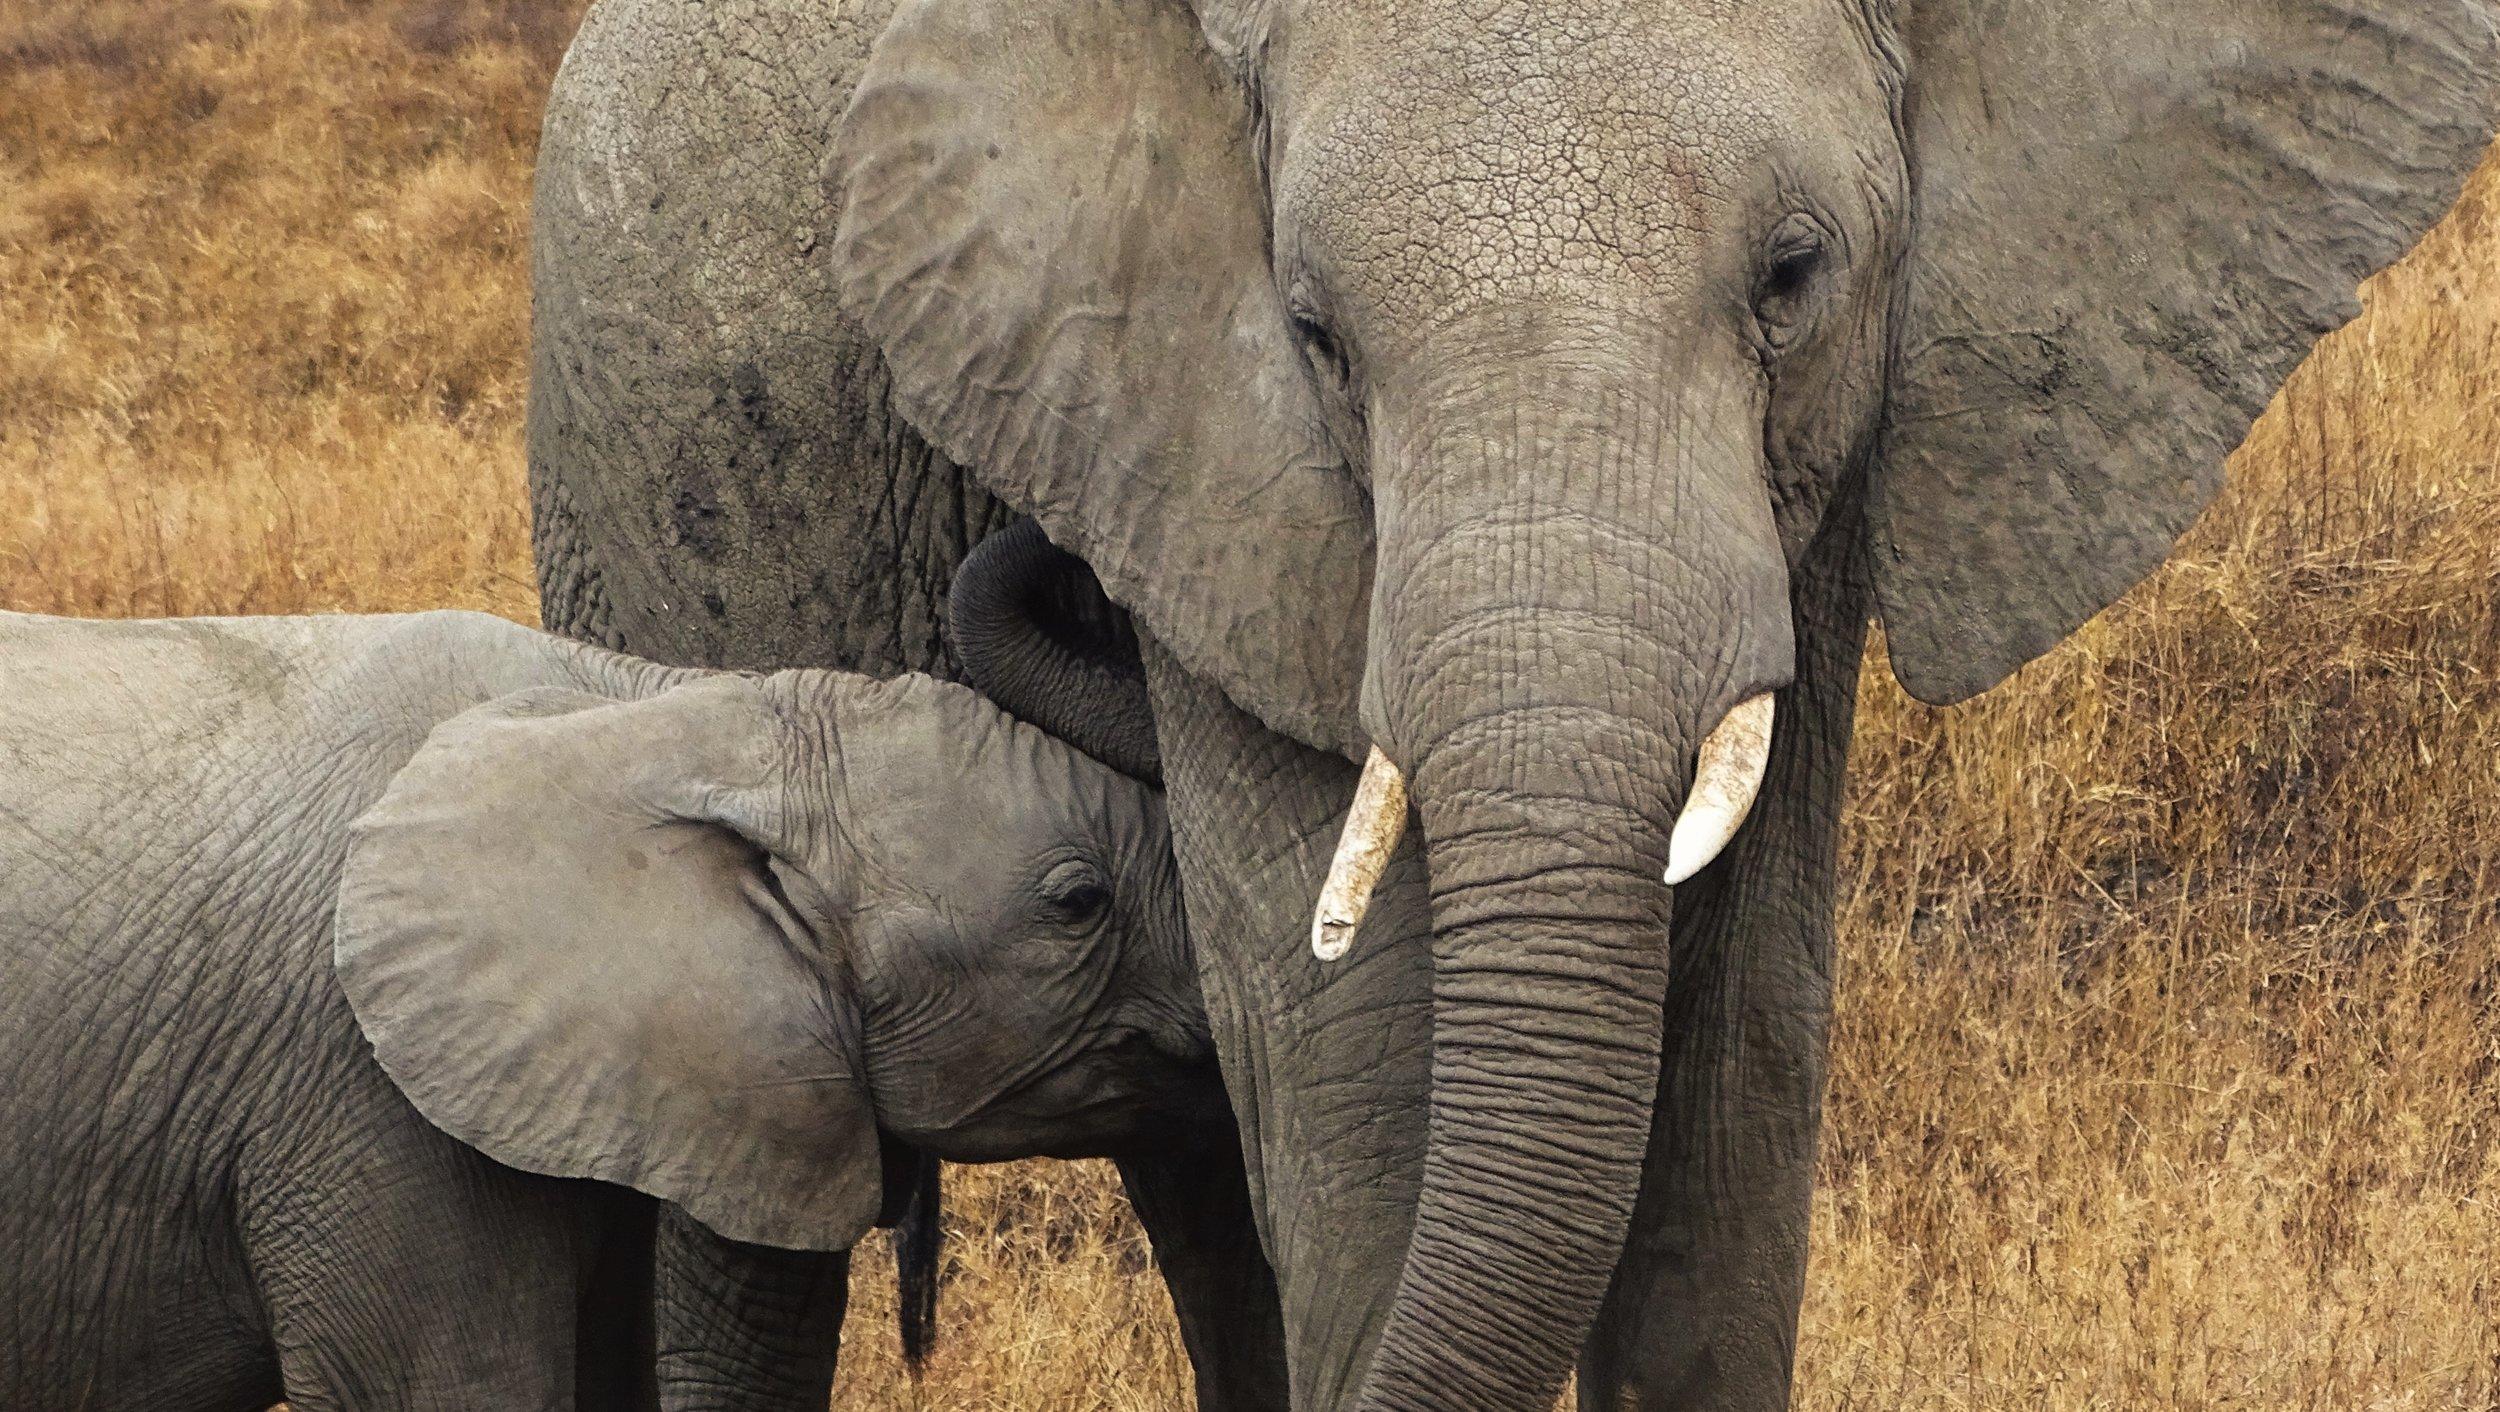 Serengeti-by-pbase.jpg